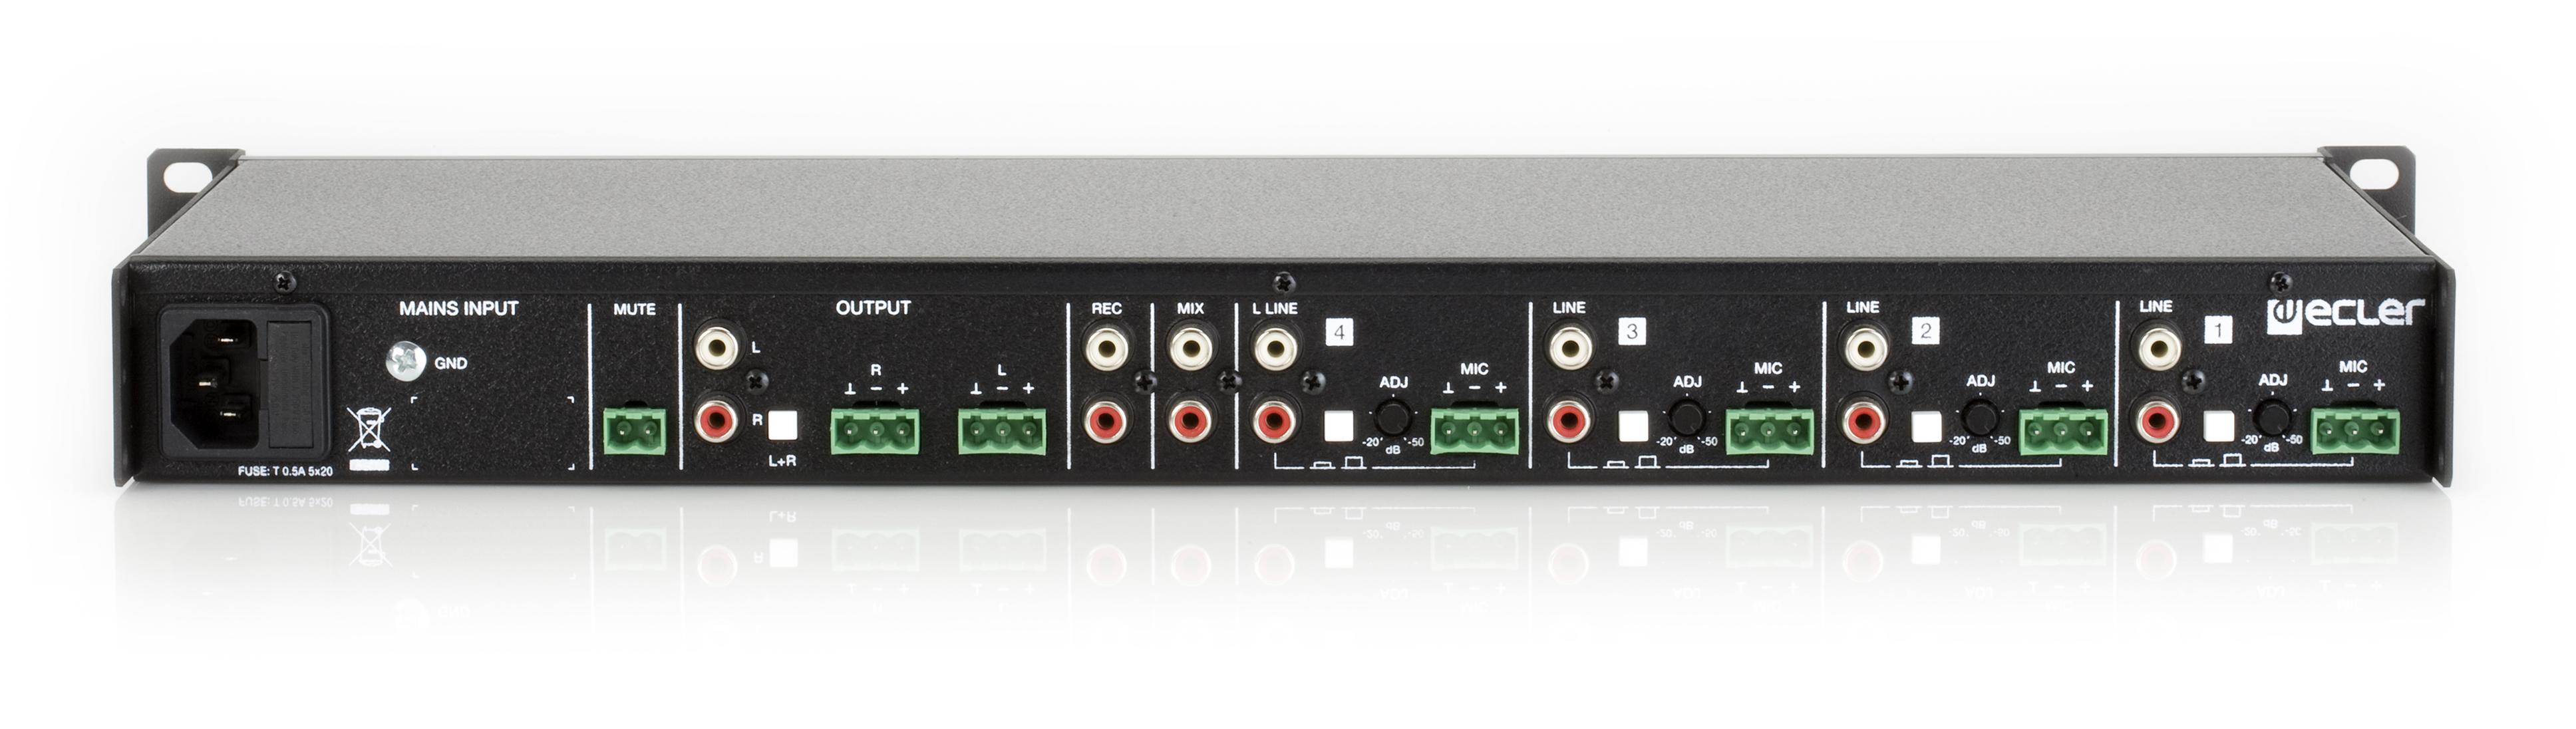 Ecler Sam412t Installation Analogue Mixer